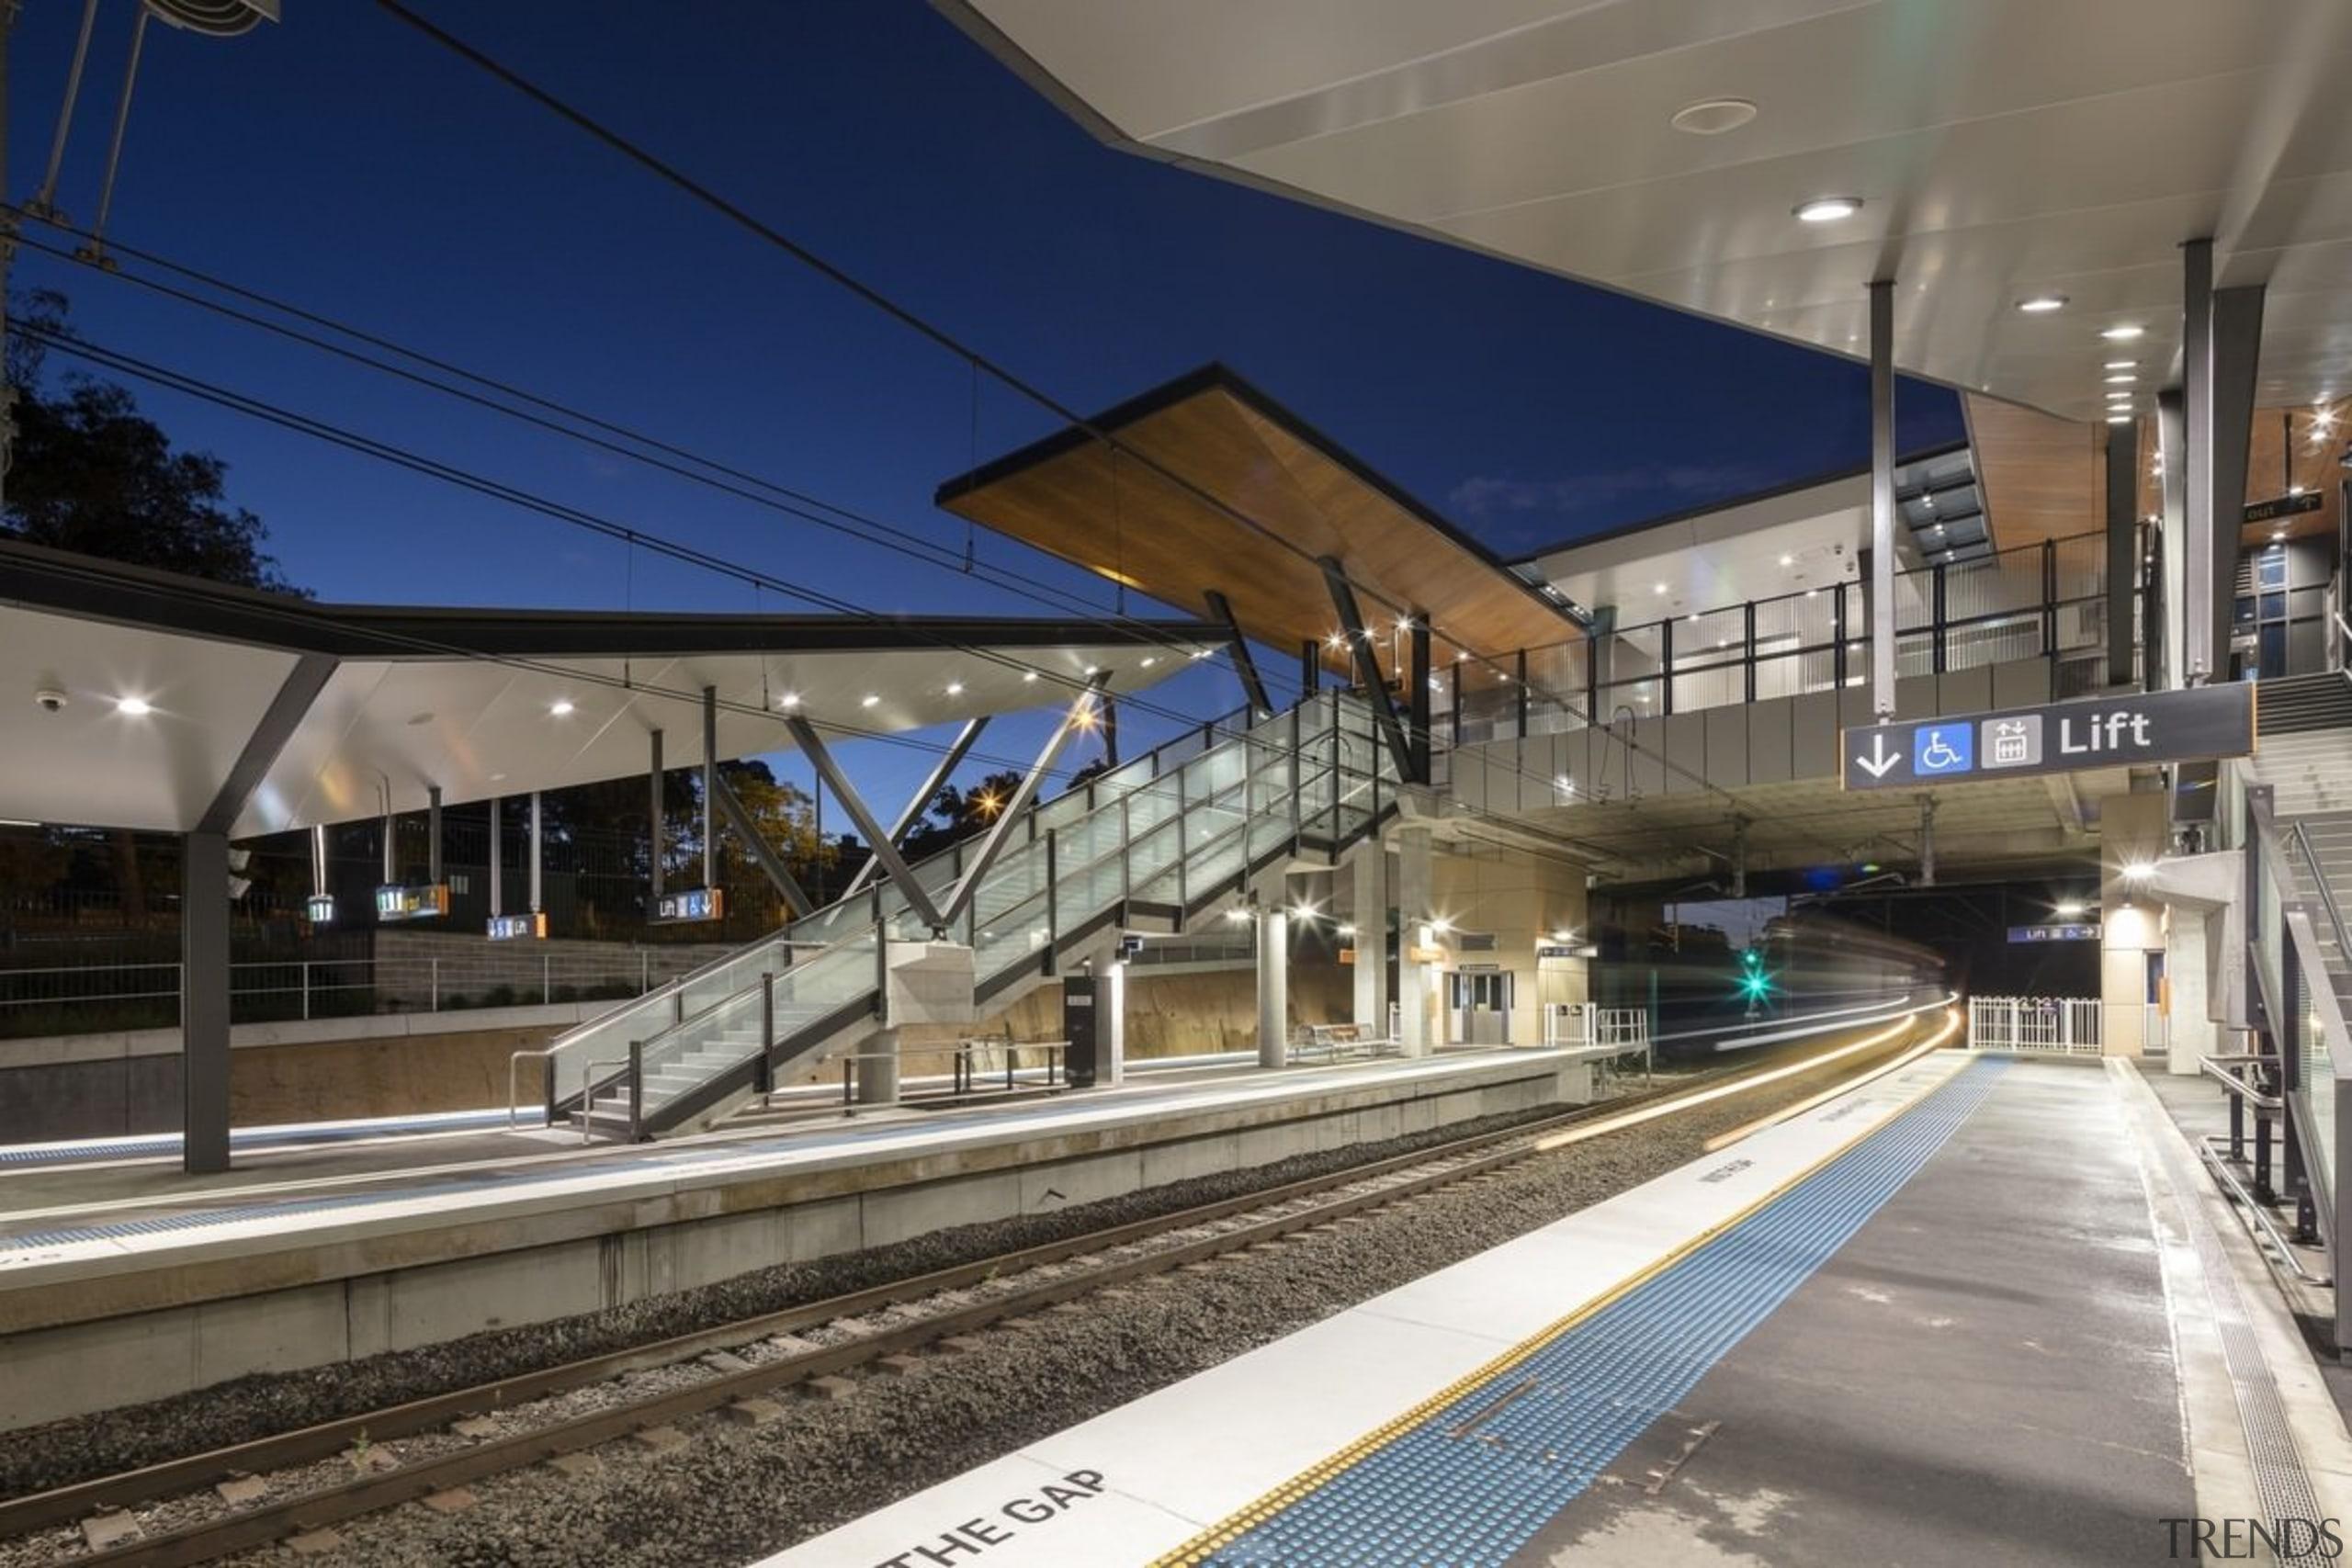 Cheltenham Station – Cox Architecture - Cheltenham Station high speed rail, metropolitan area, public transport, track, train, train station, transport, gray